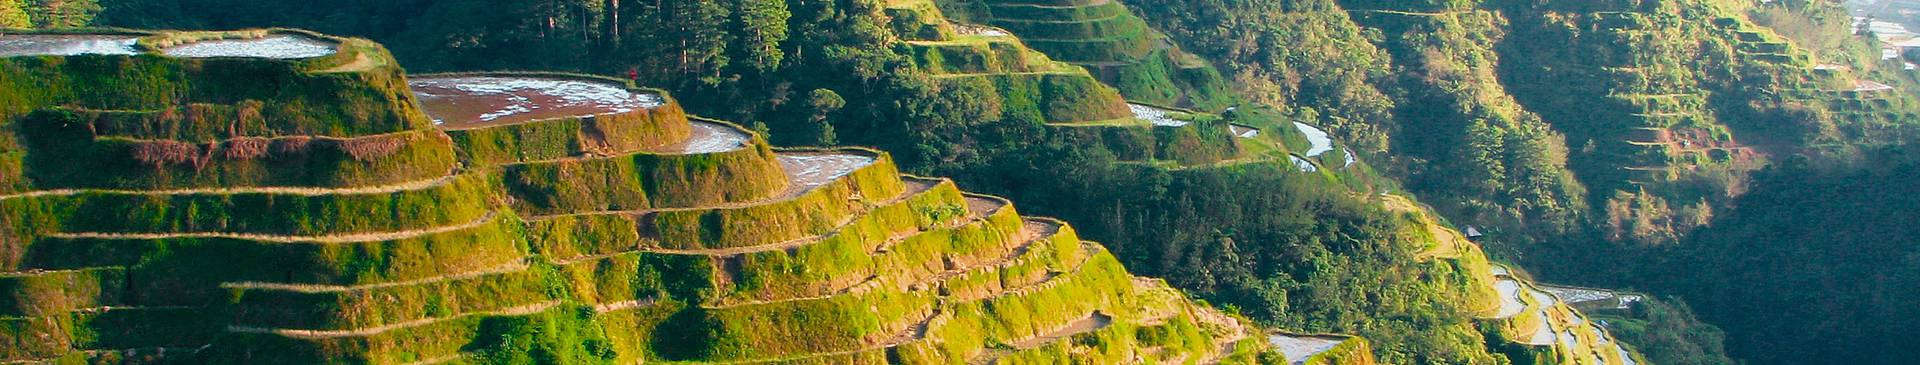 Naturreisen Philippinen